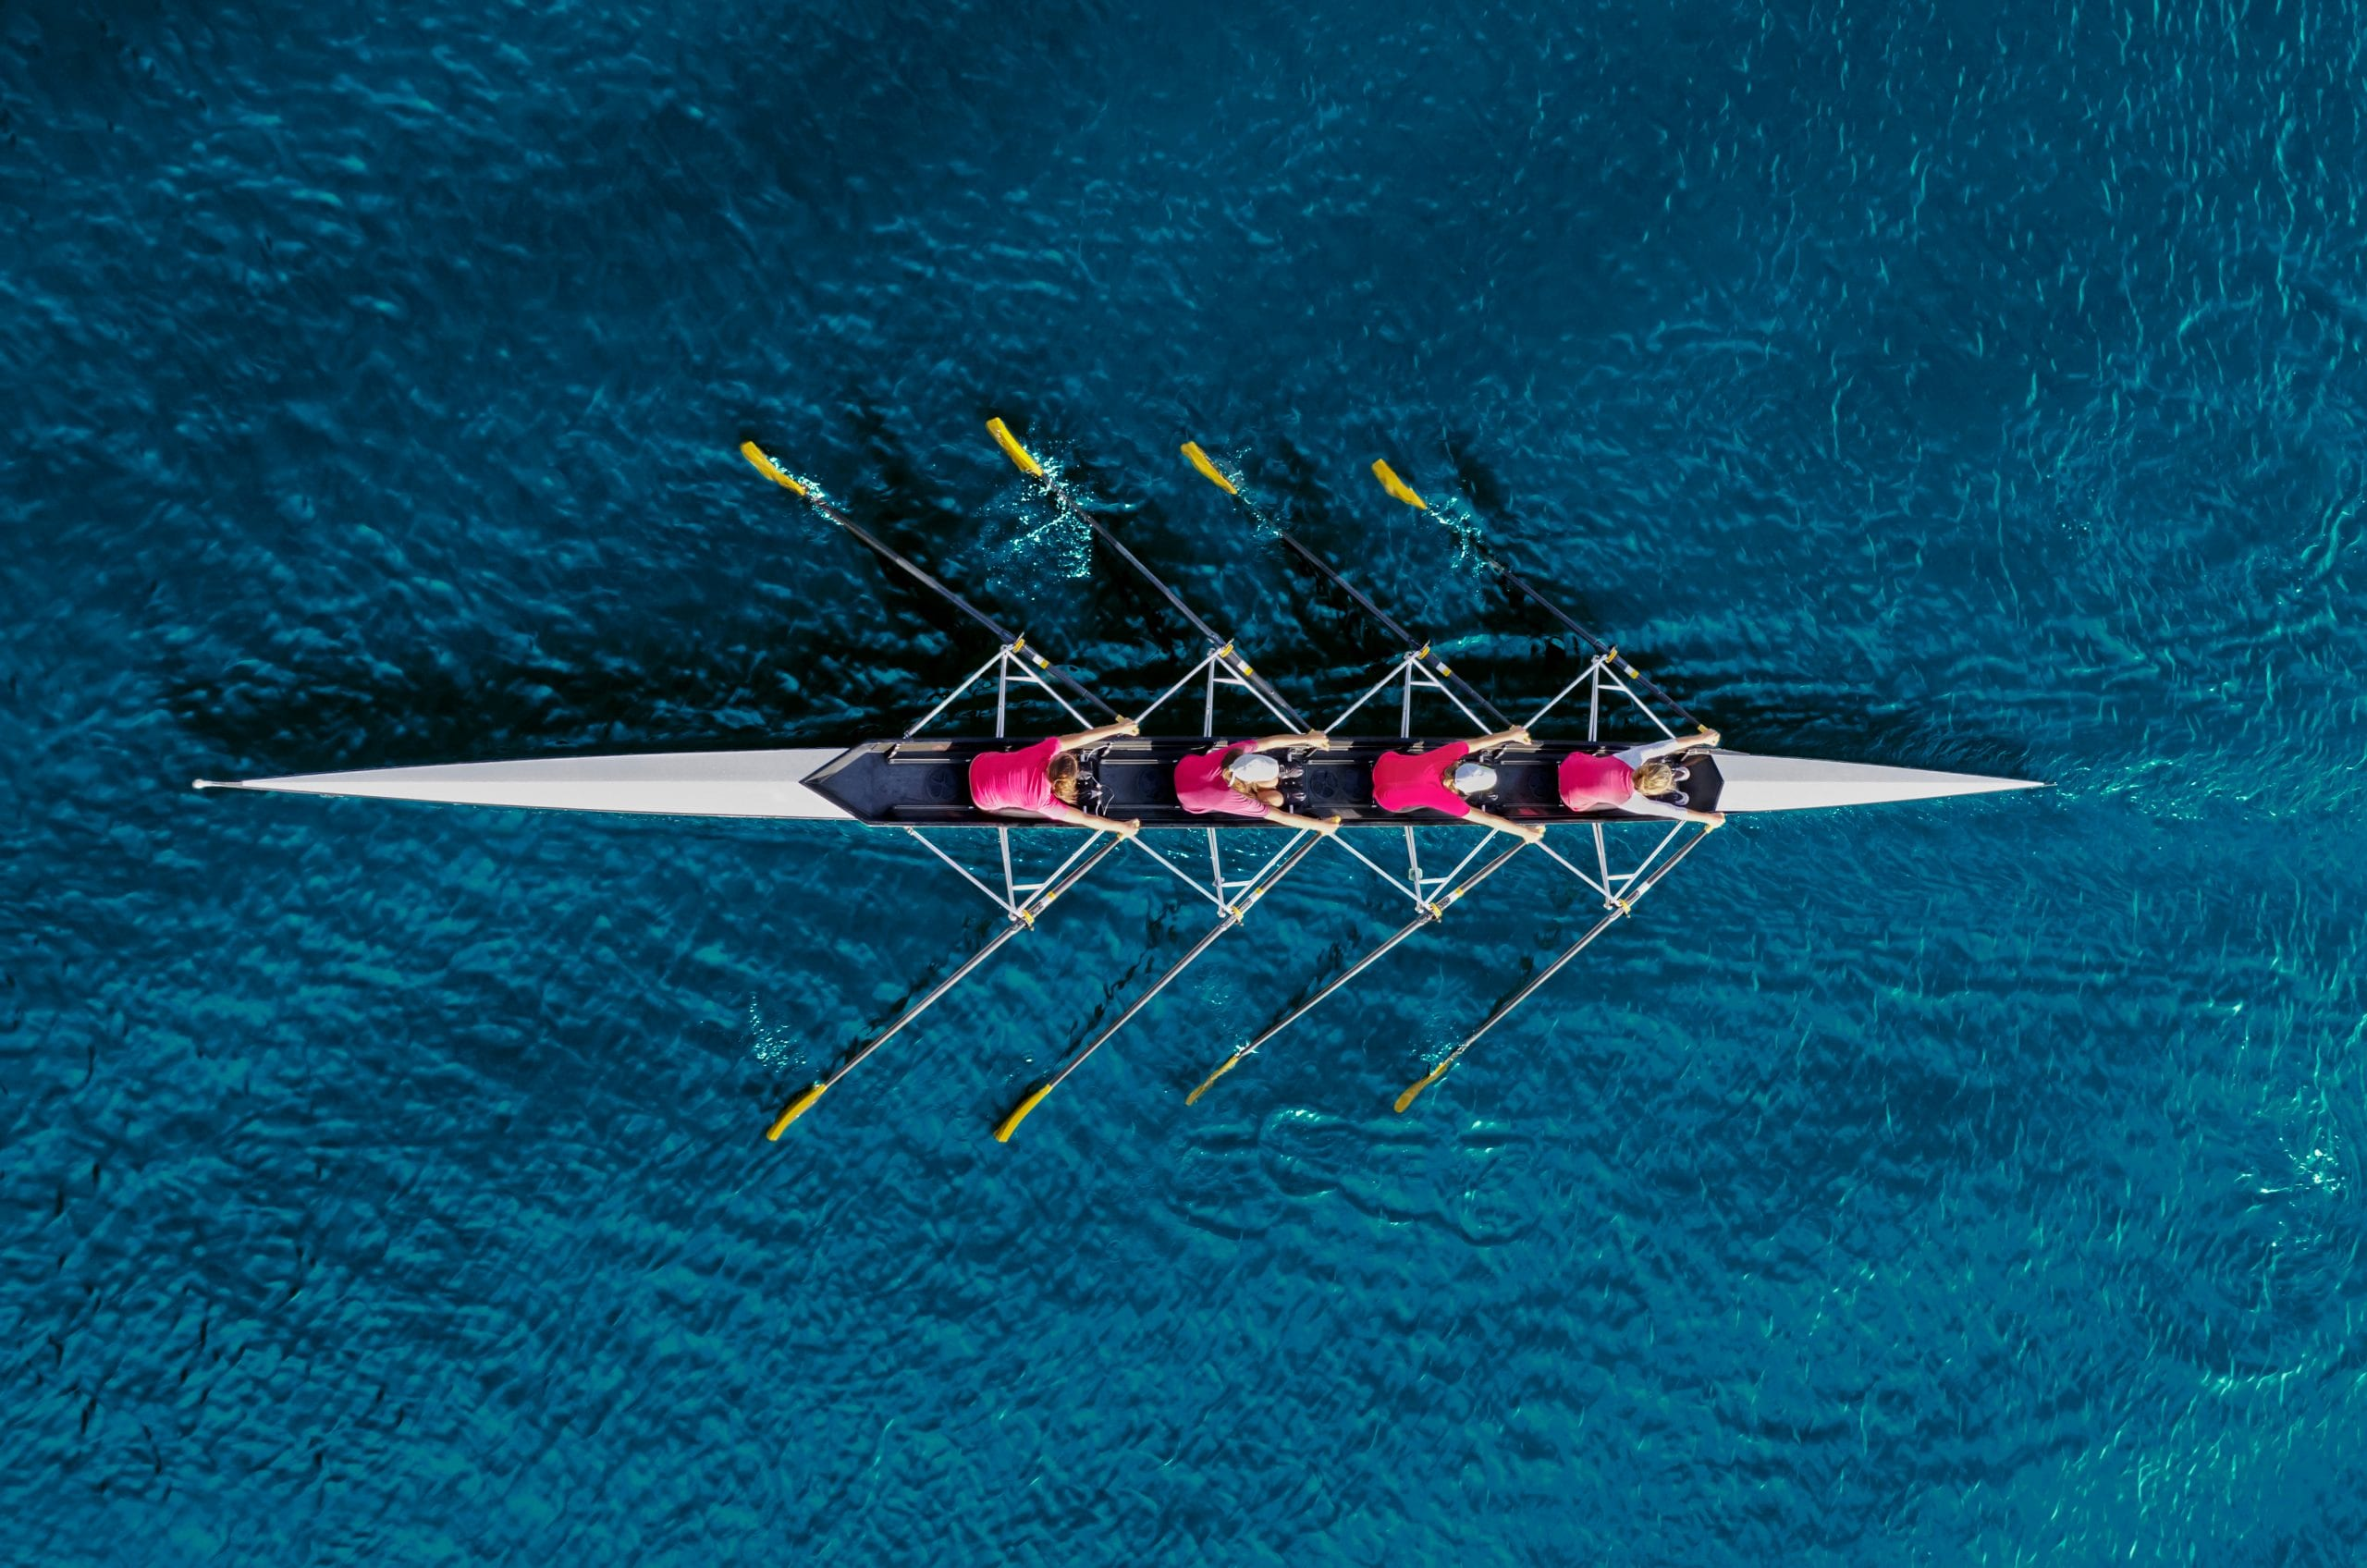 teamwork - group rowing boat